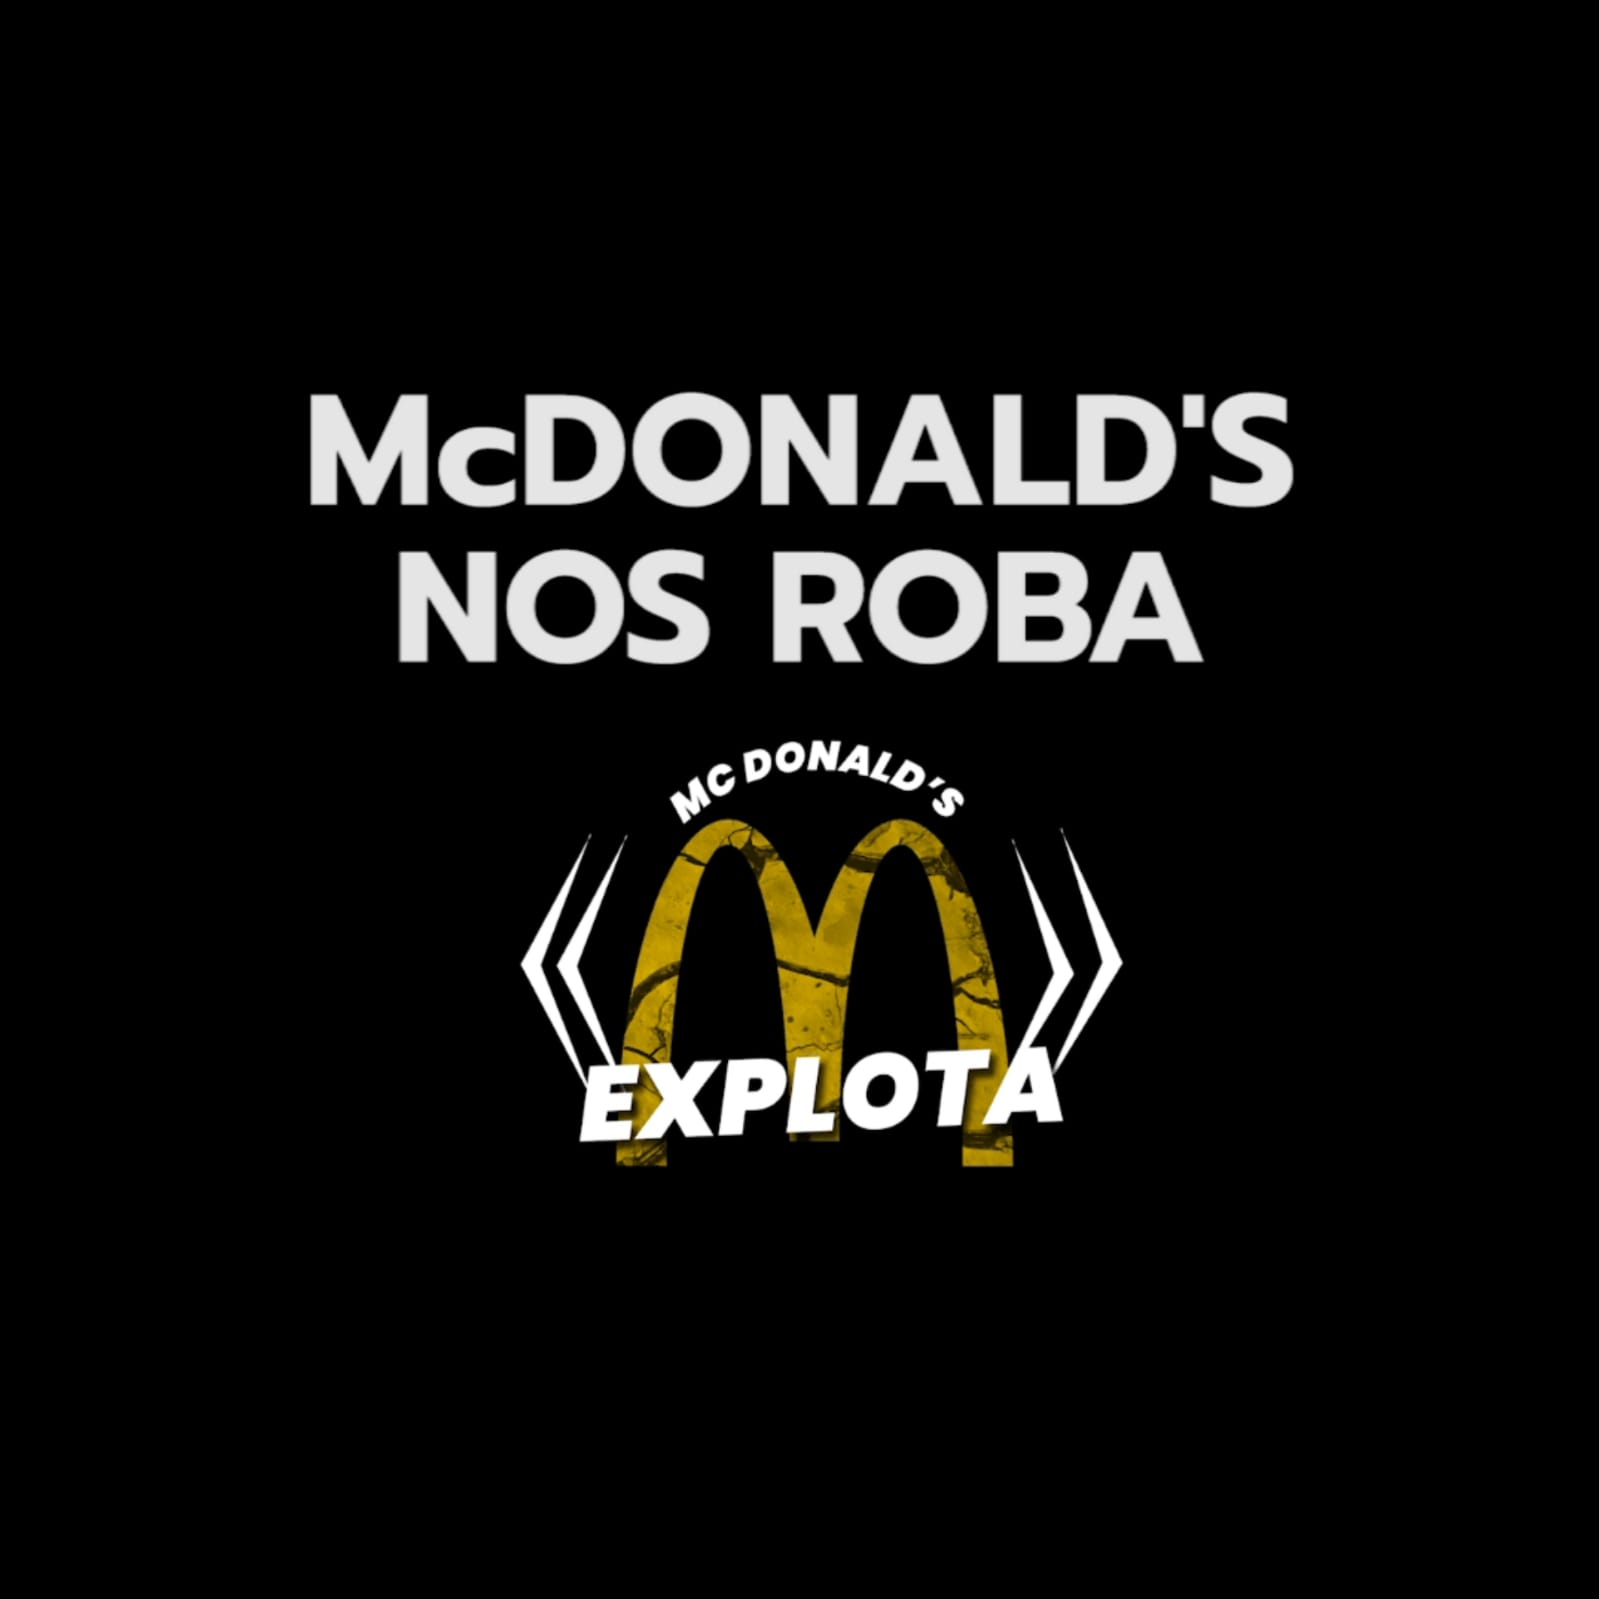 Mcdonald's Explota